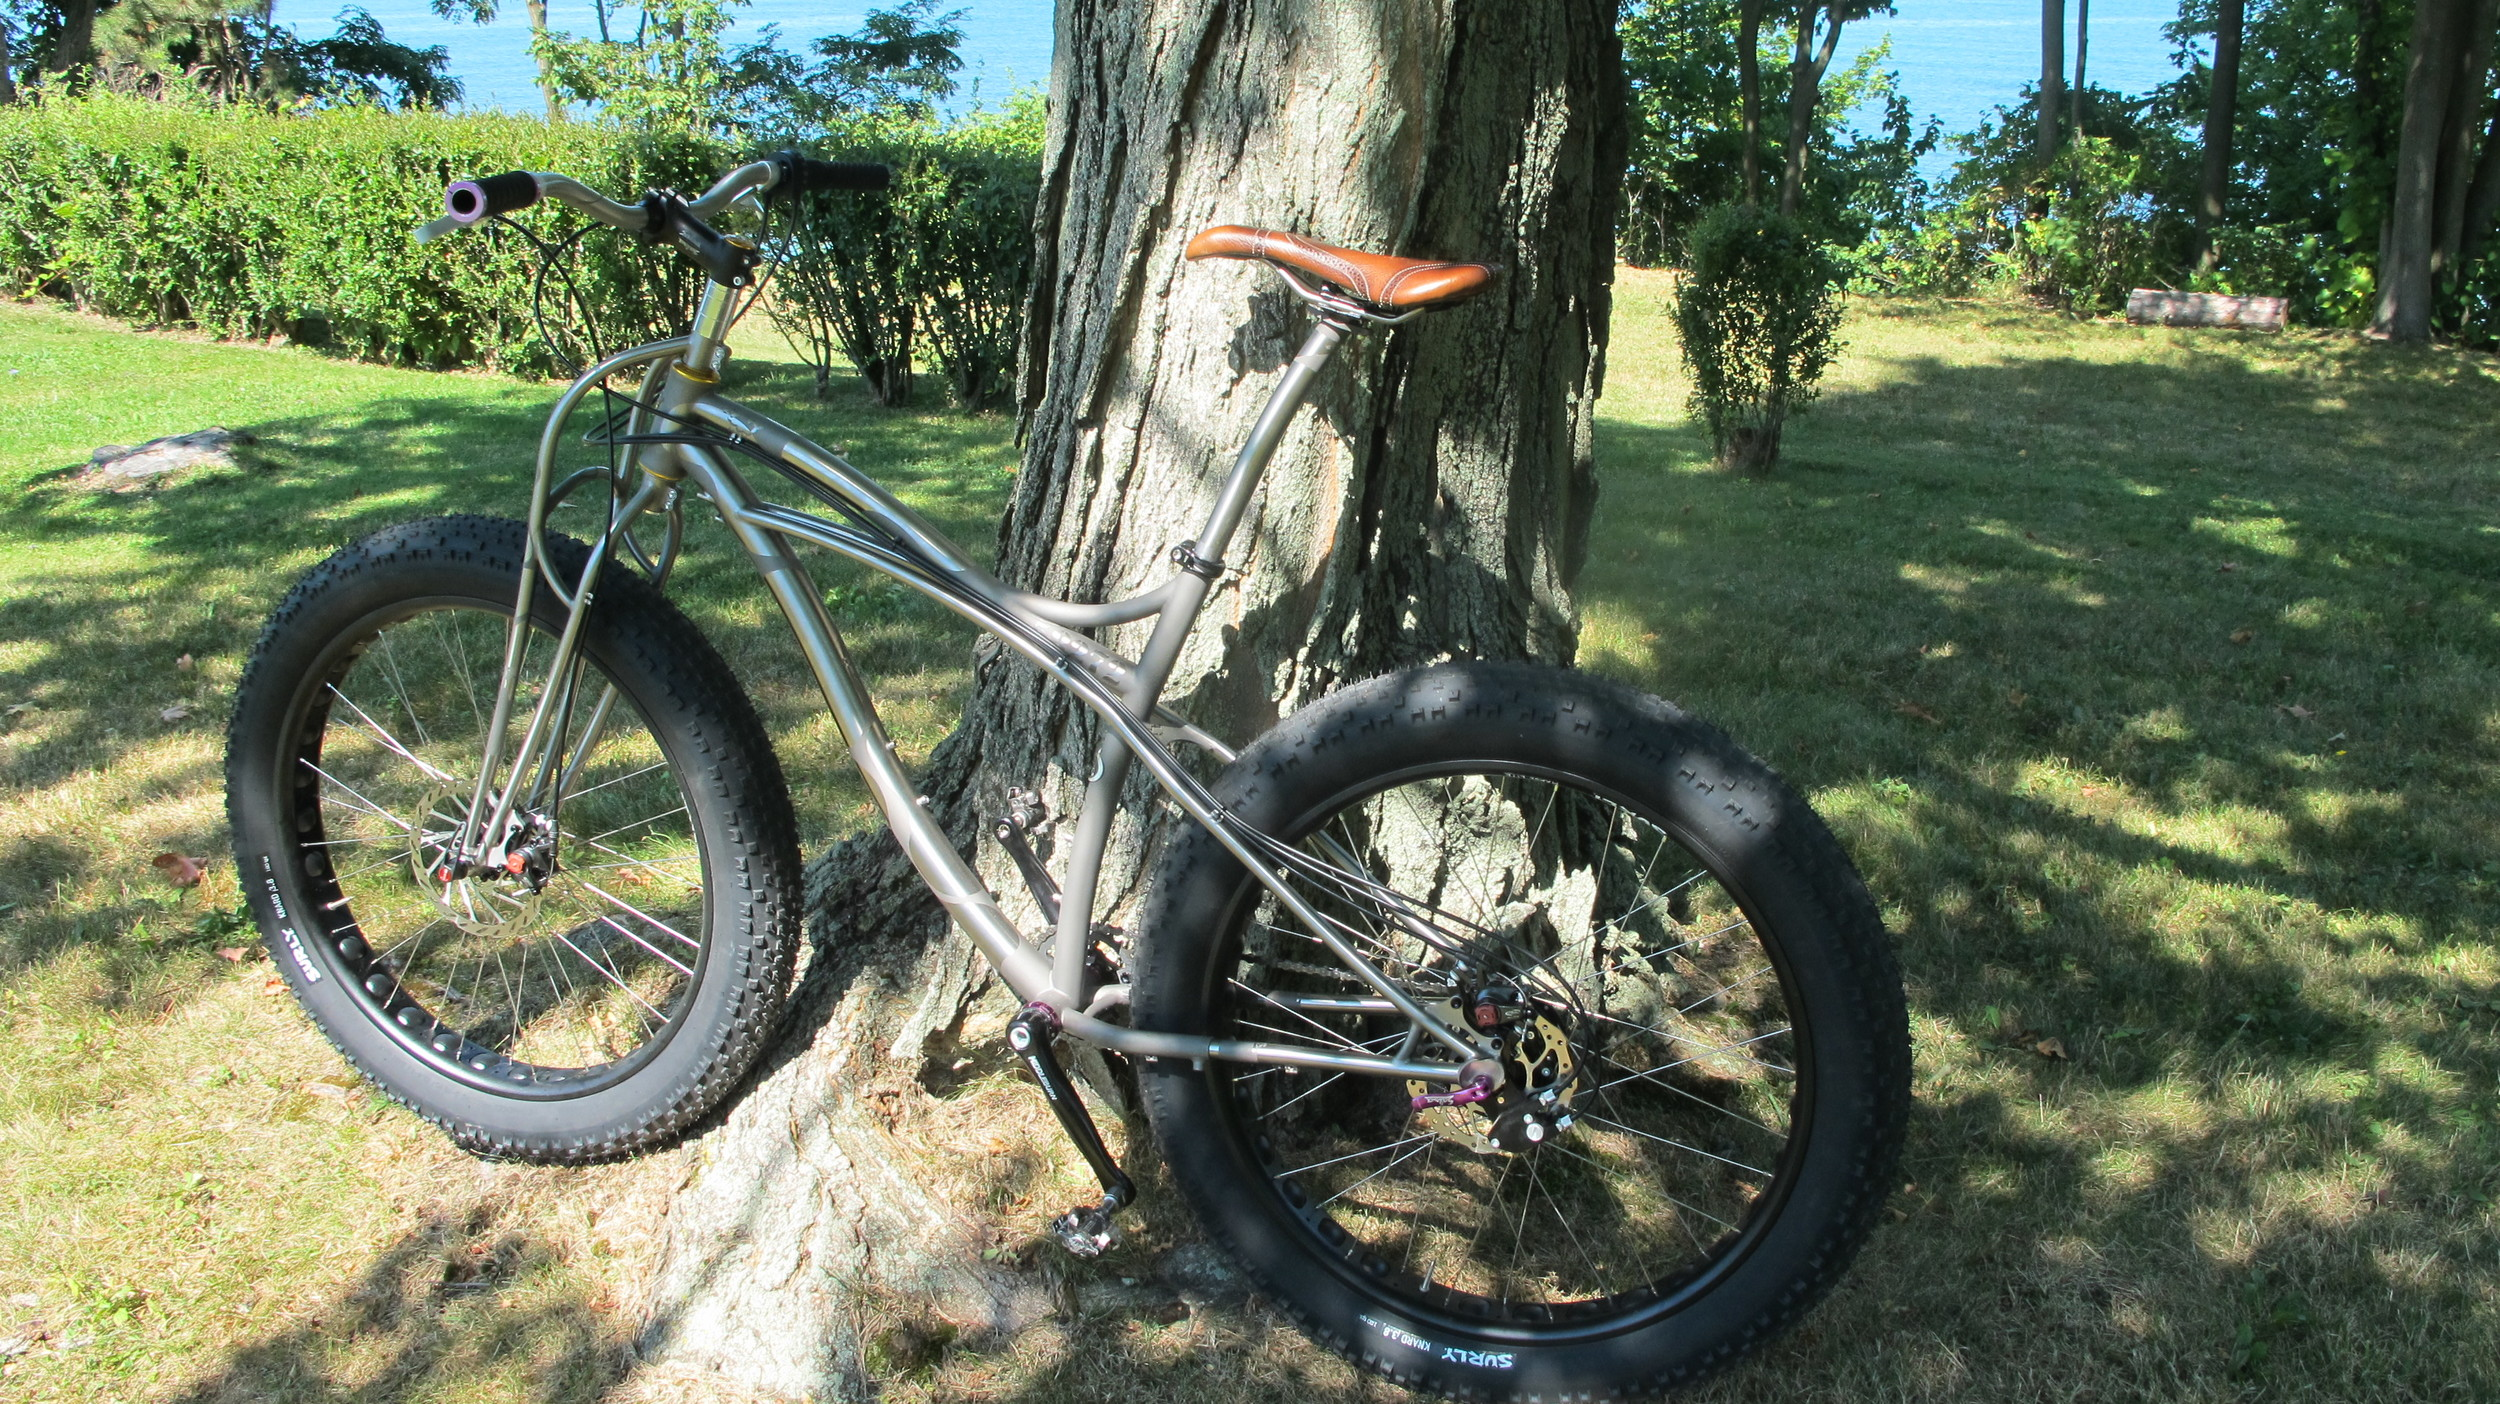 Tom-Huntly-Blacksheep-Fatbike-custom-leather-bike-seat-saddle-handmade-frame-leather.JPG